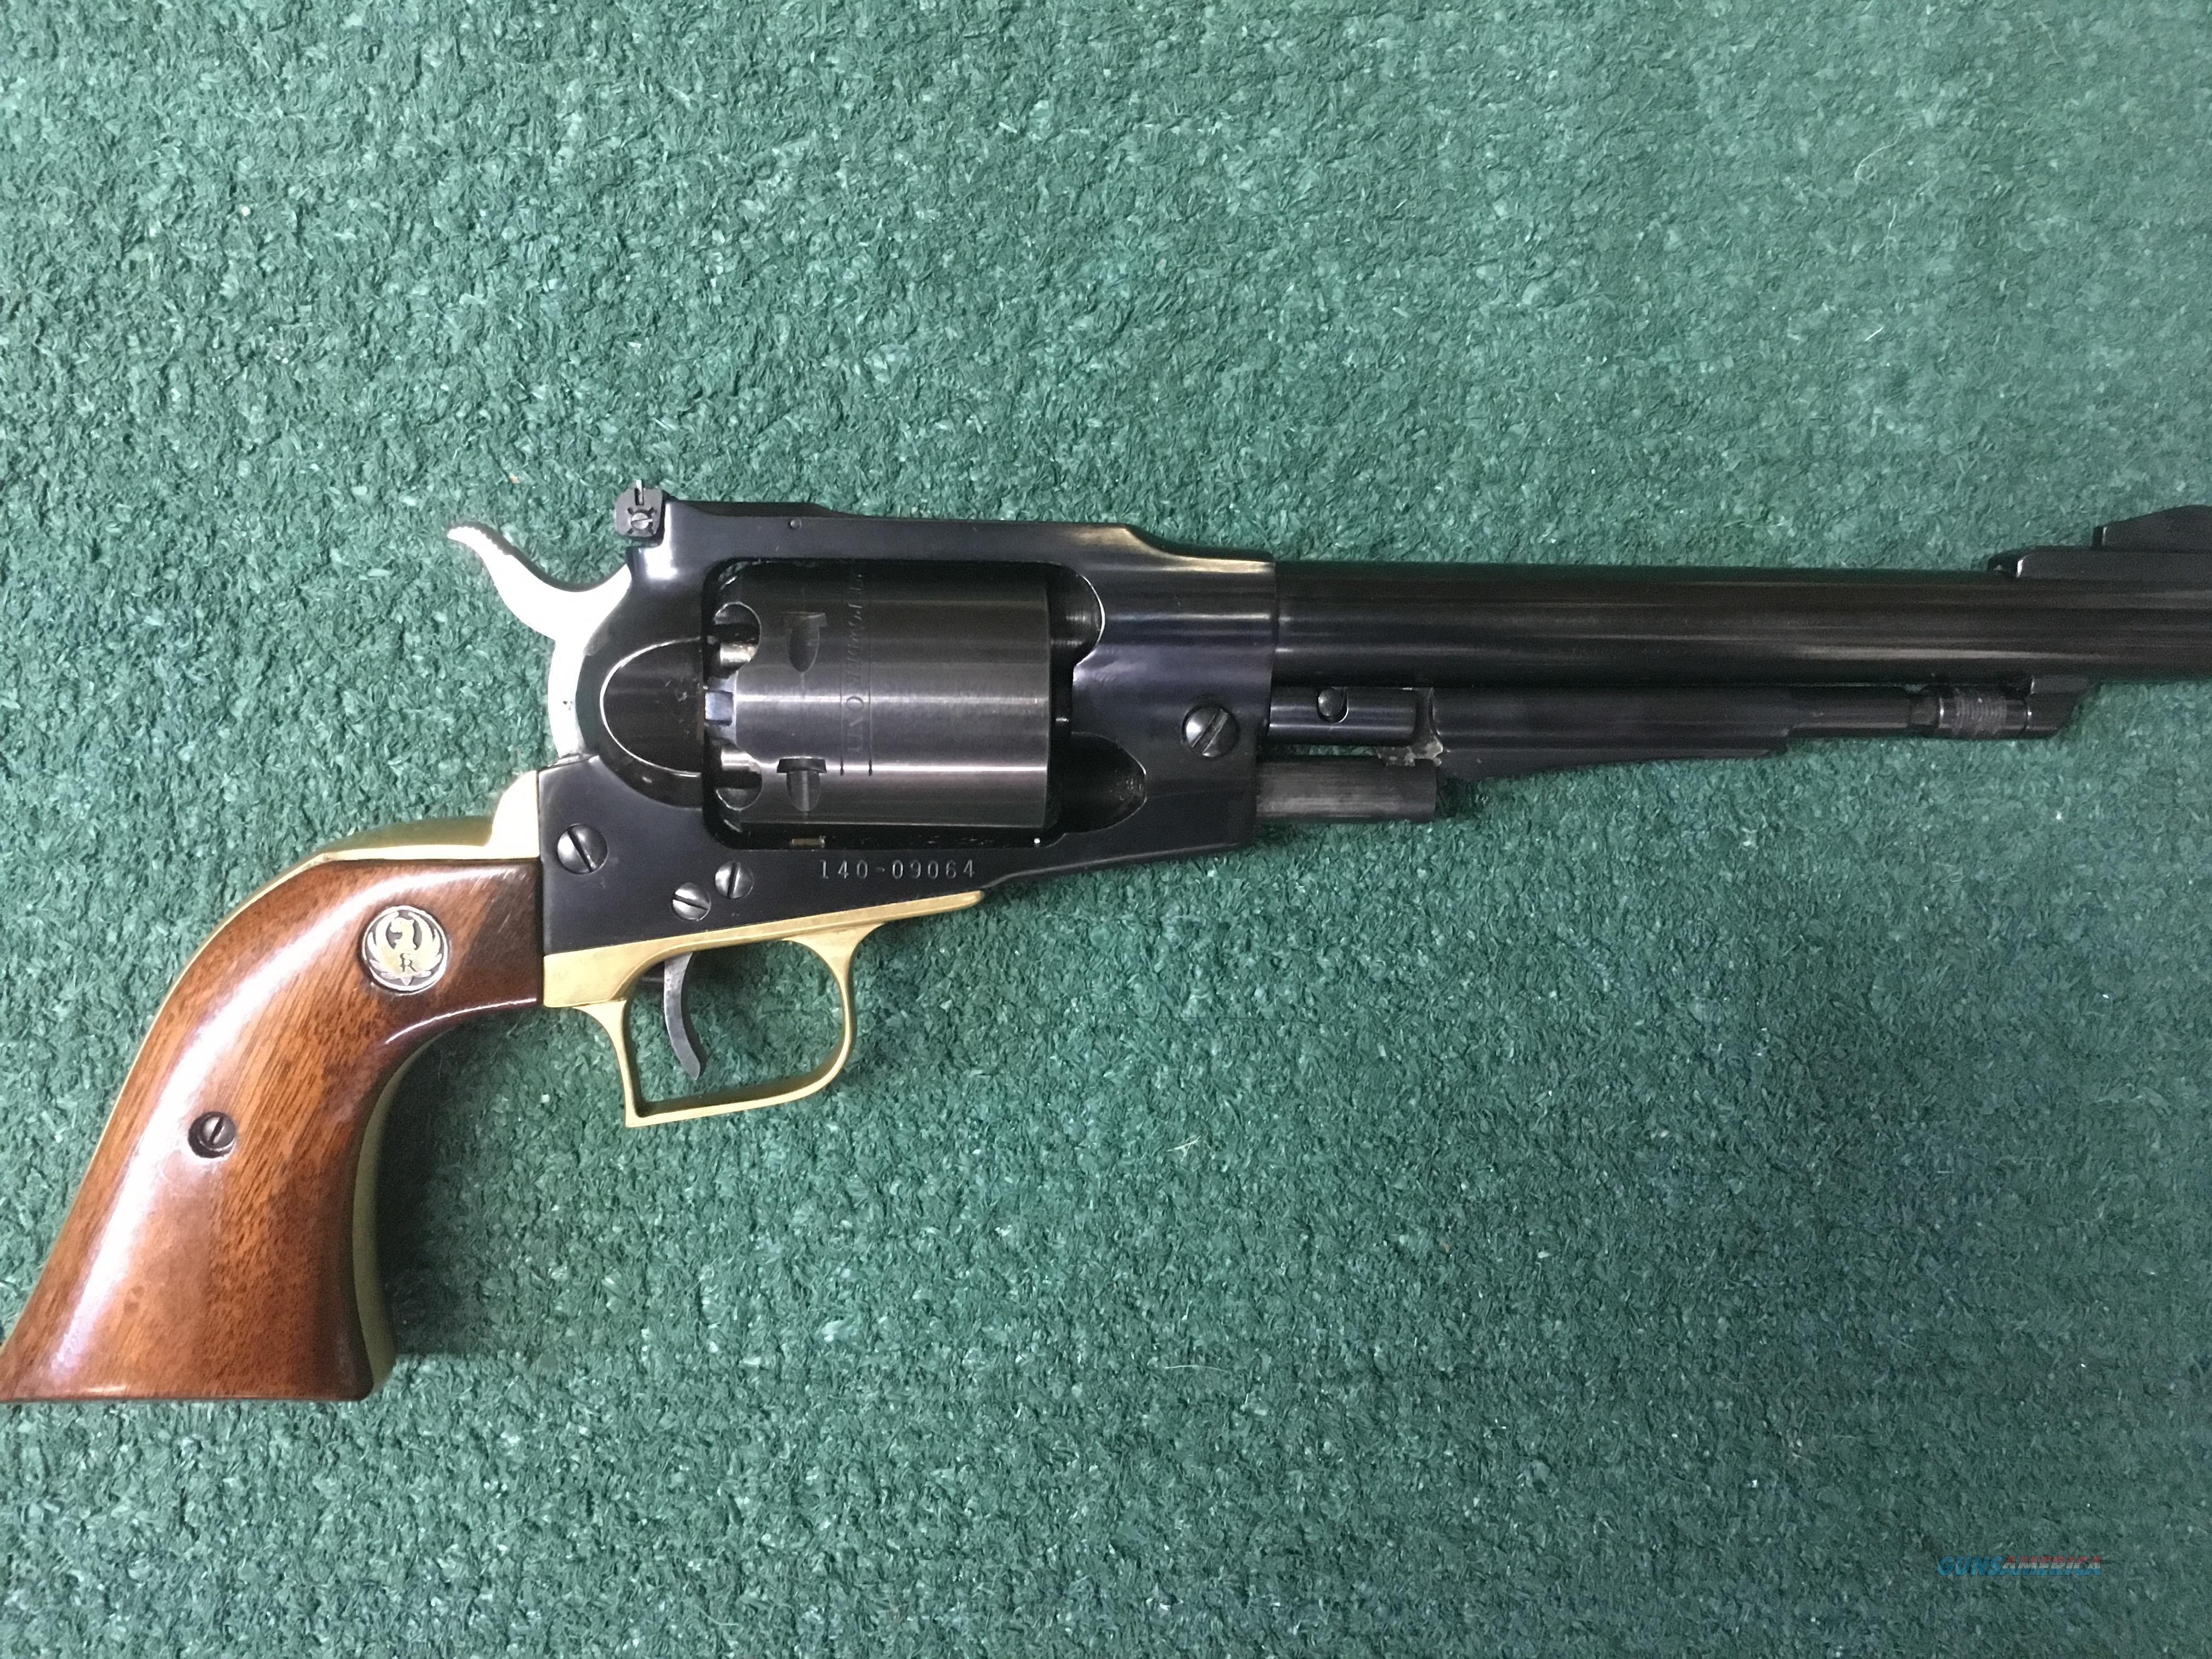 Ruger Old Army  44 Caliber RARE!! Brass Trigger Guard and Back Strap Black  Powder 6 shot Revolver